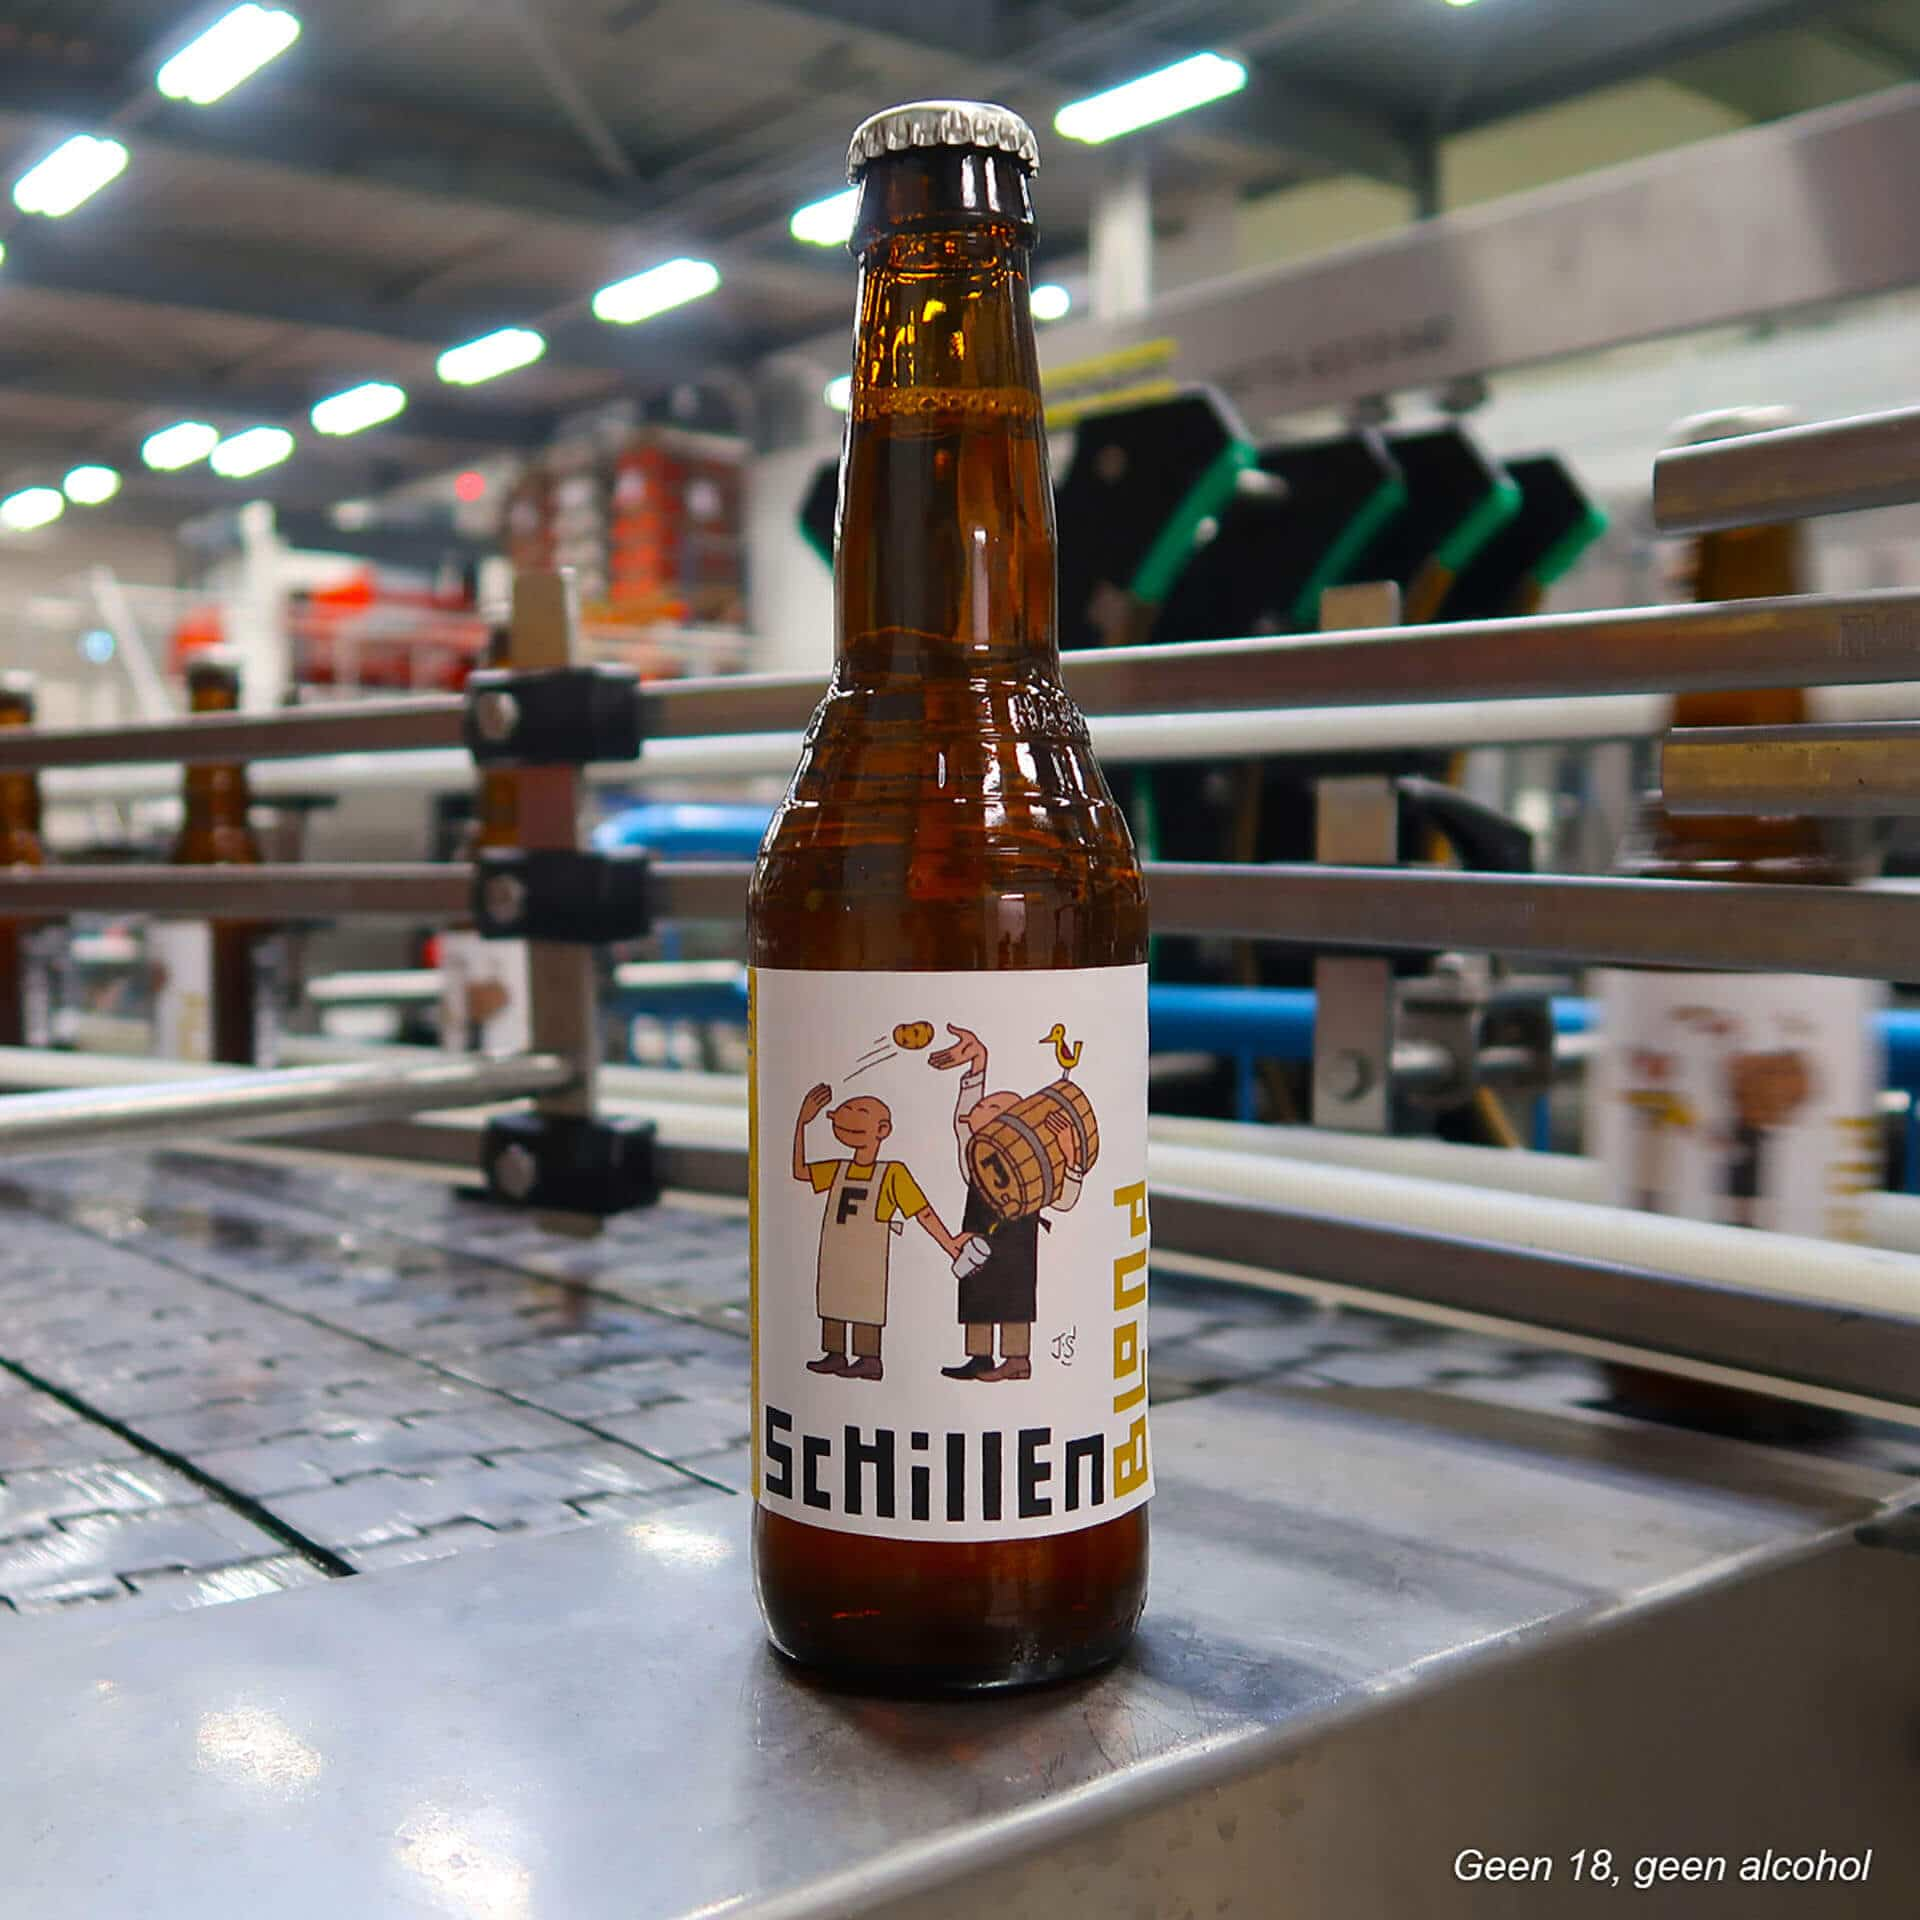 Schillen Blond bier FrietHoes